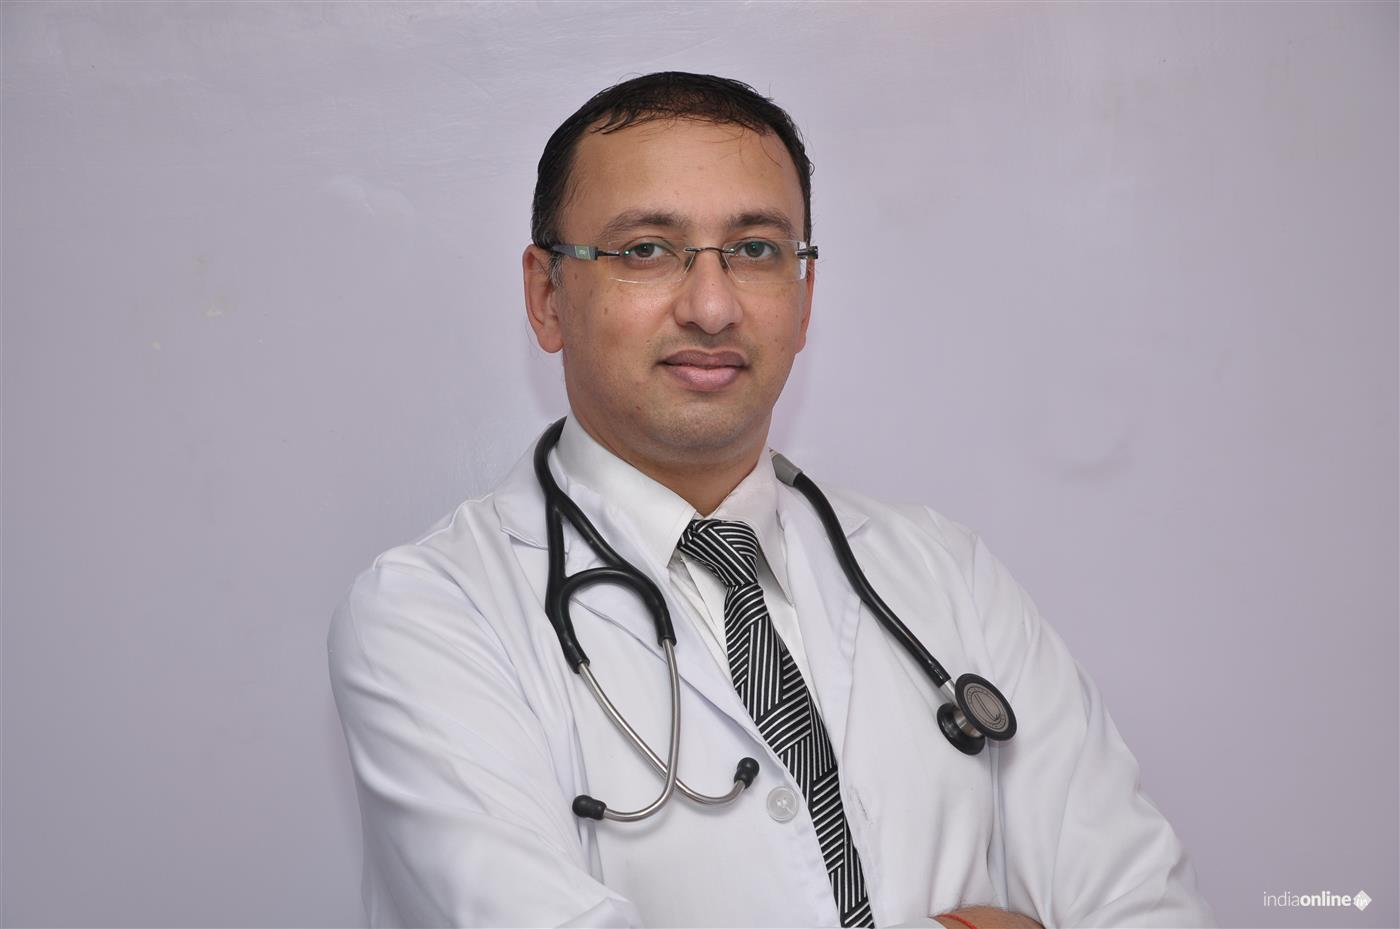 Dr. Gaurav Narain Gupta